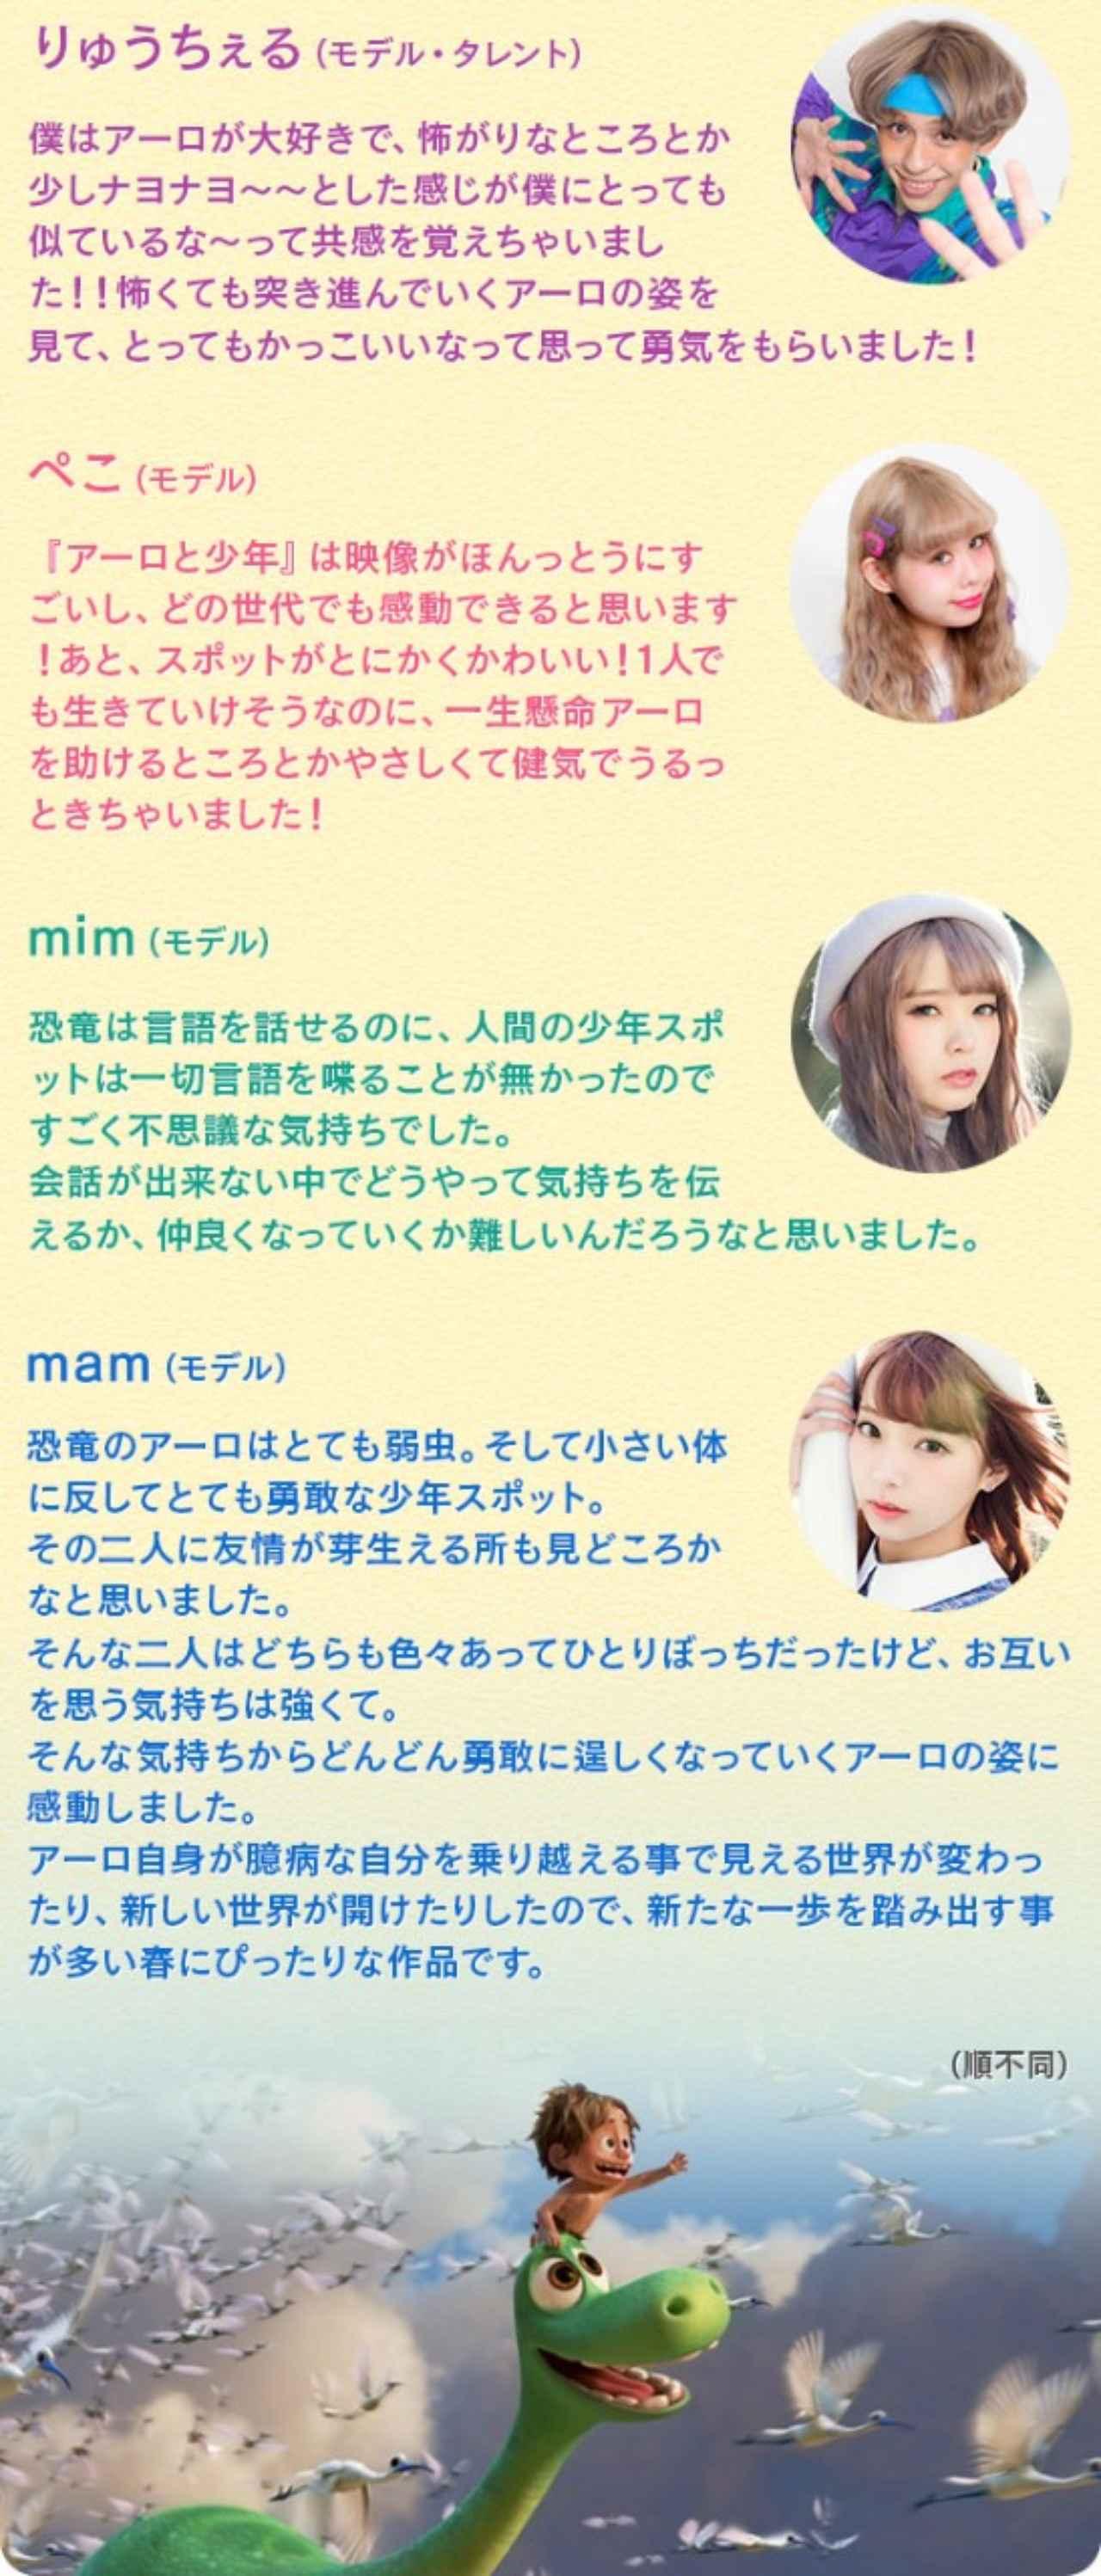 画像5: www.disney.co.jp